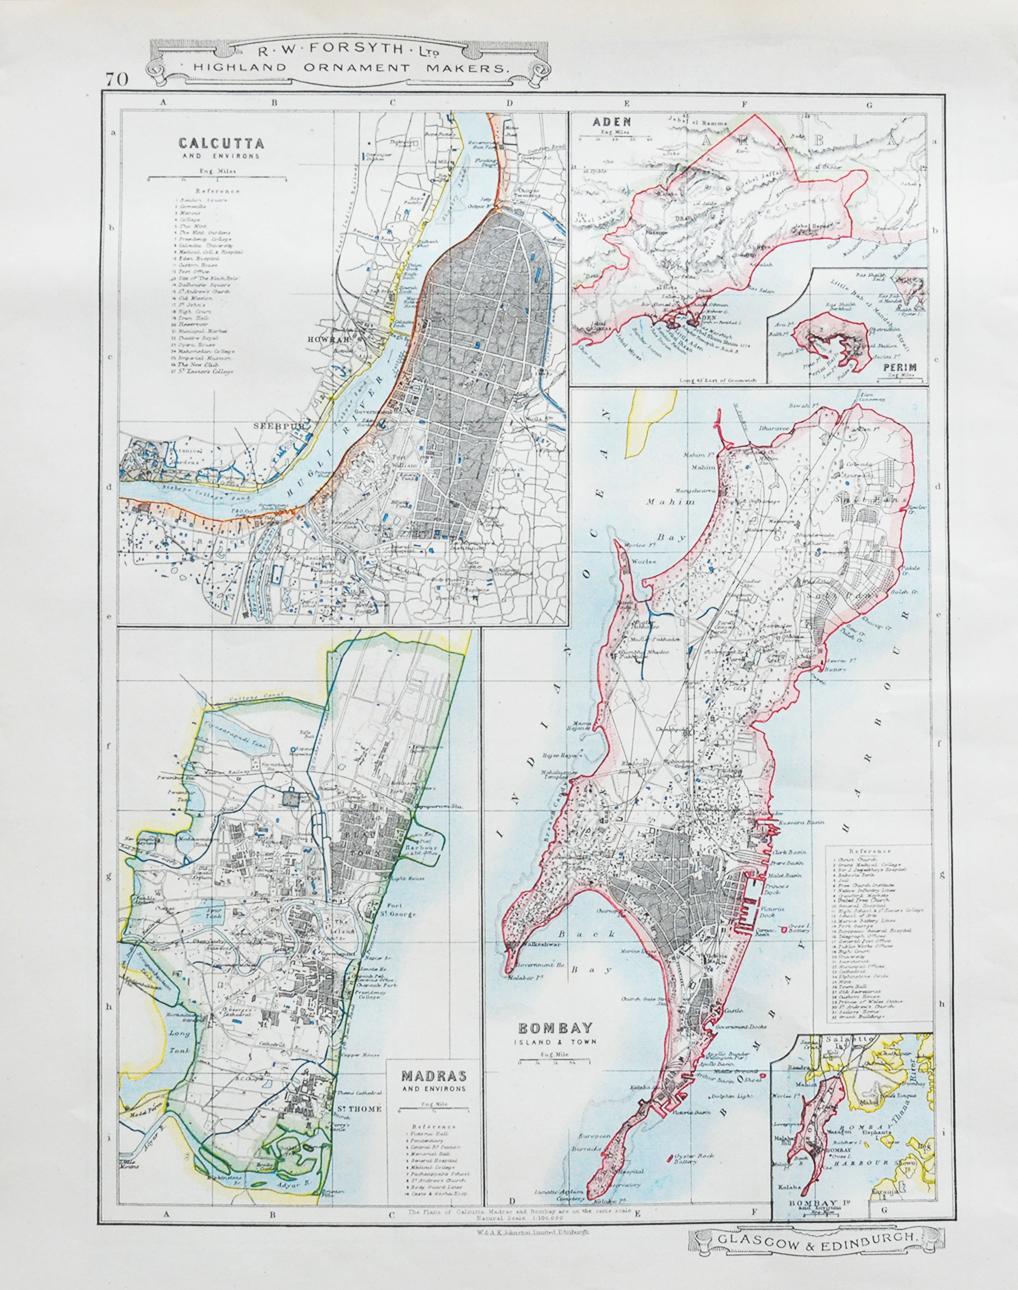 Aden, Bombay, Madras & Calcutta - Vintage Map 1910